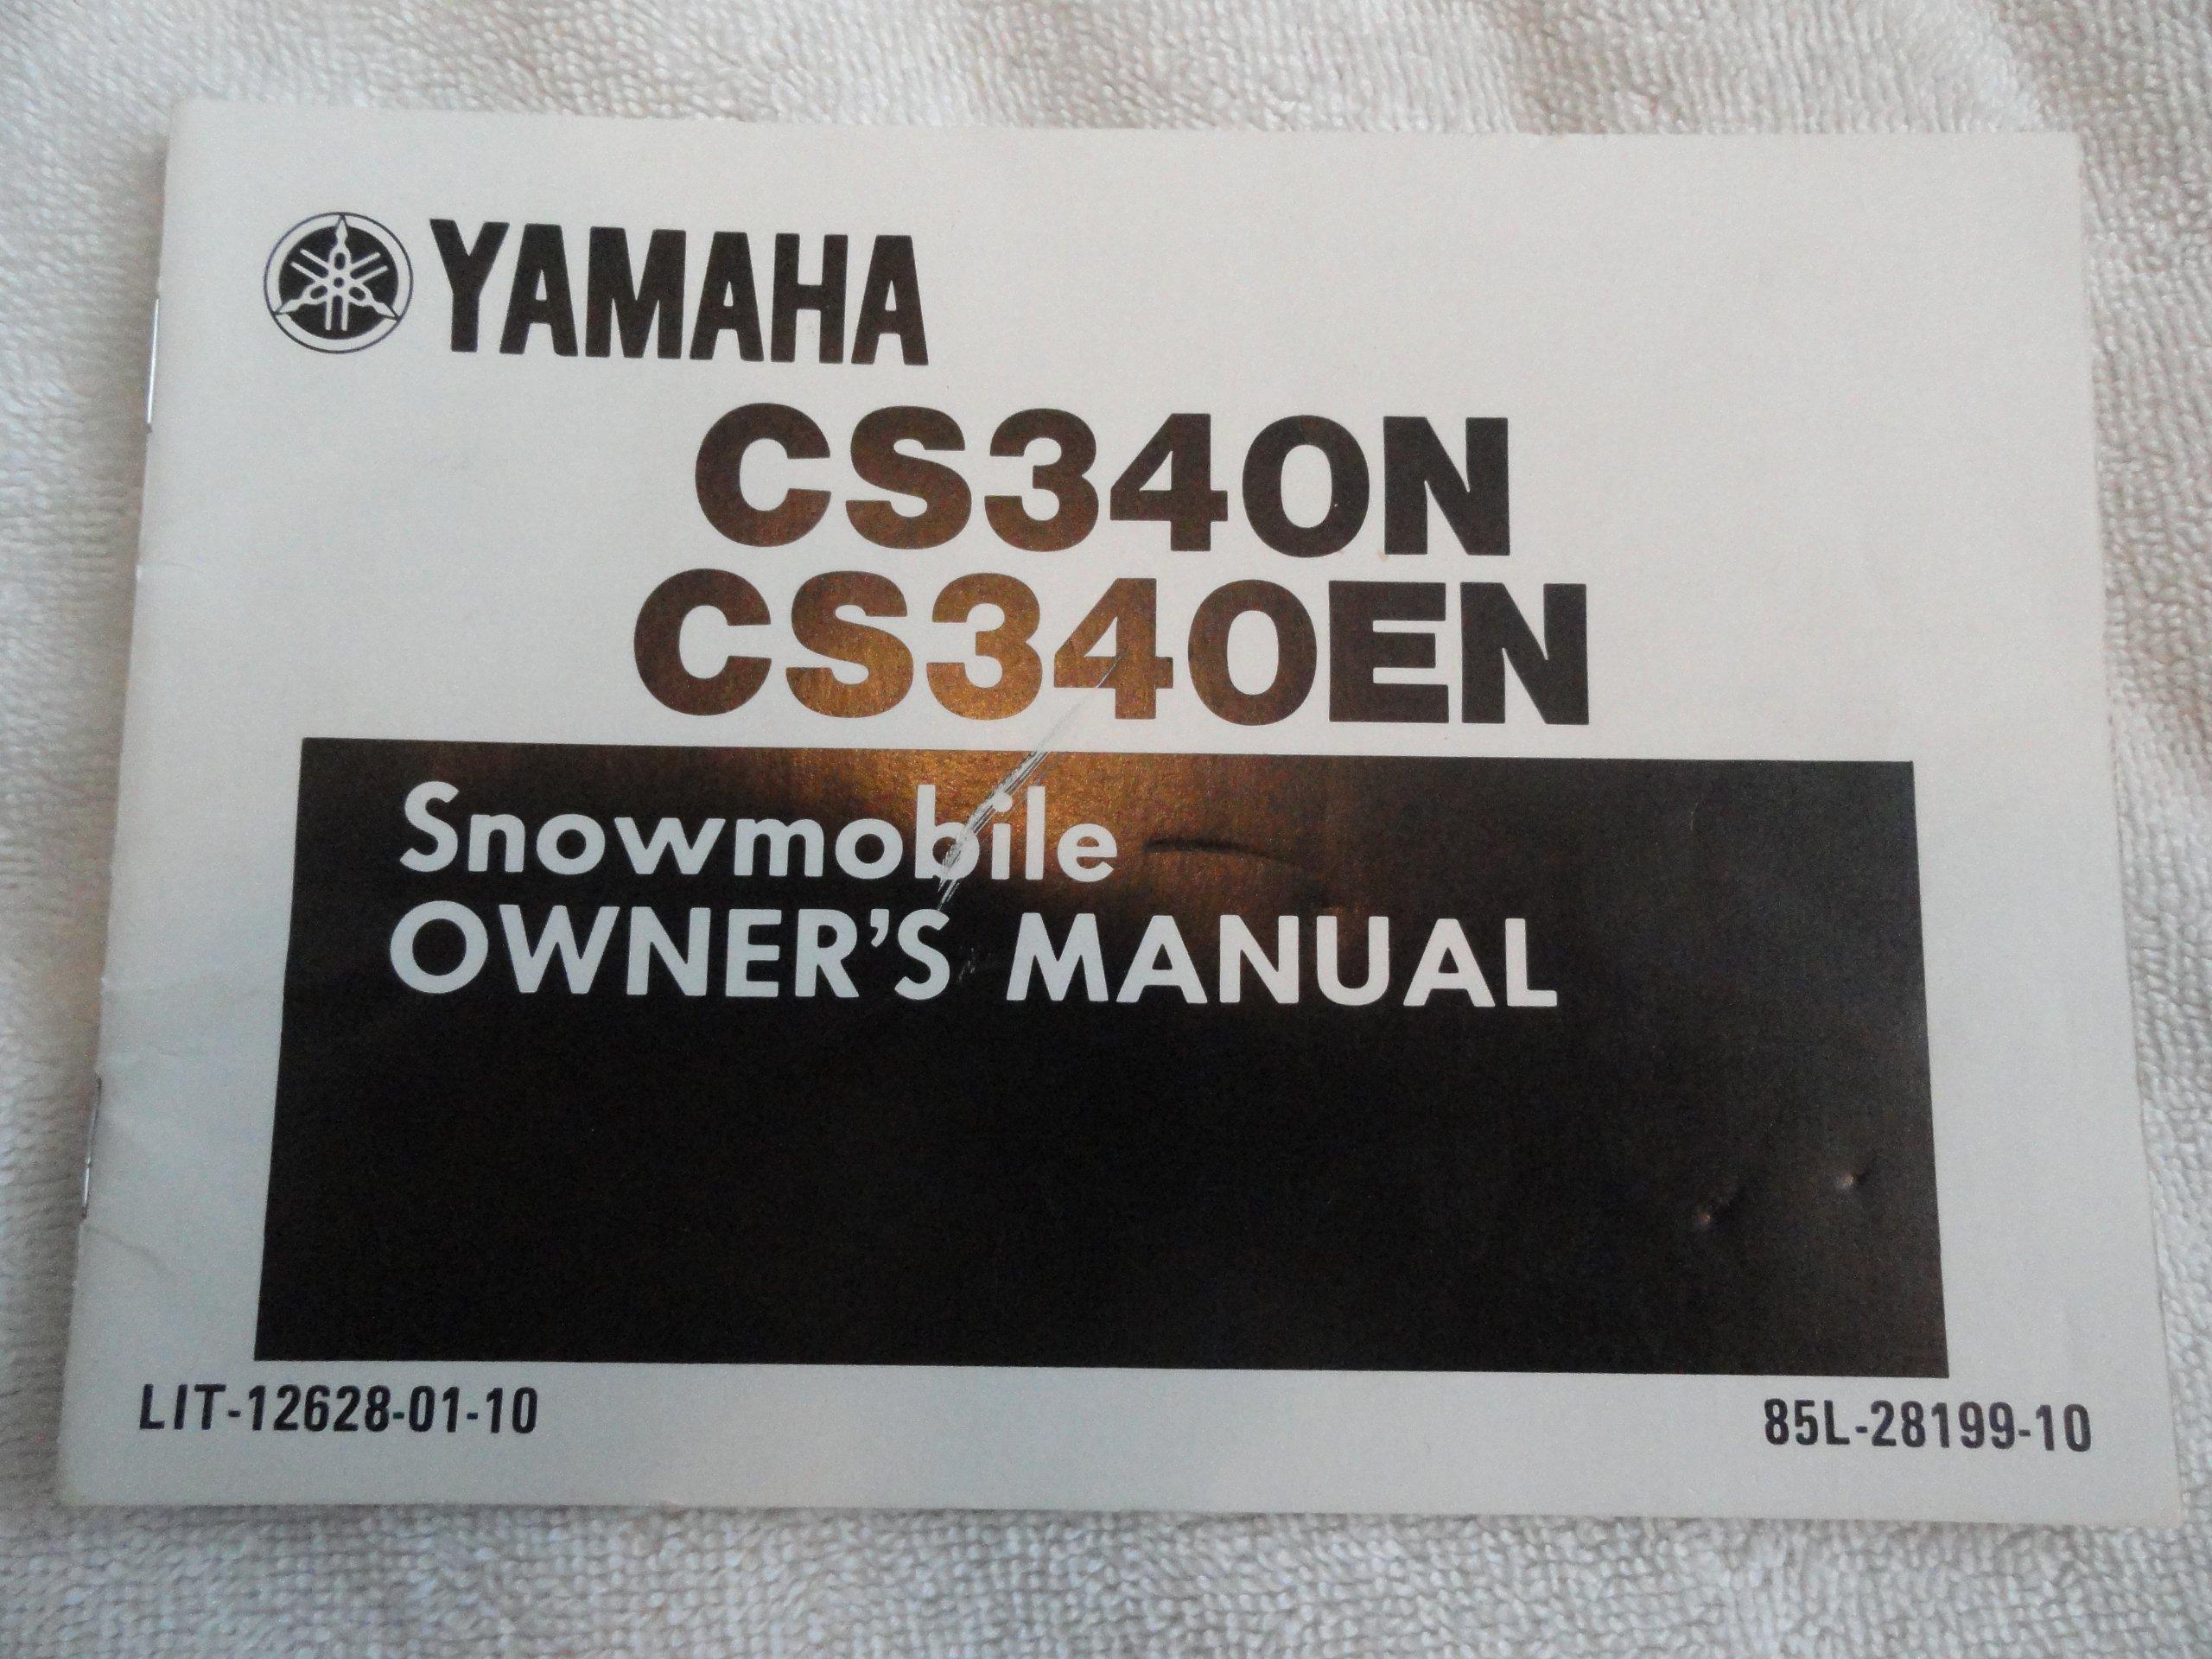 1988 1989 Yamaha Snowmobile Owners Manual CS 340 N / EN: Yamaha:  Amazon.com: Books